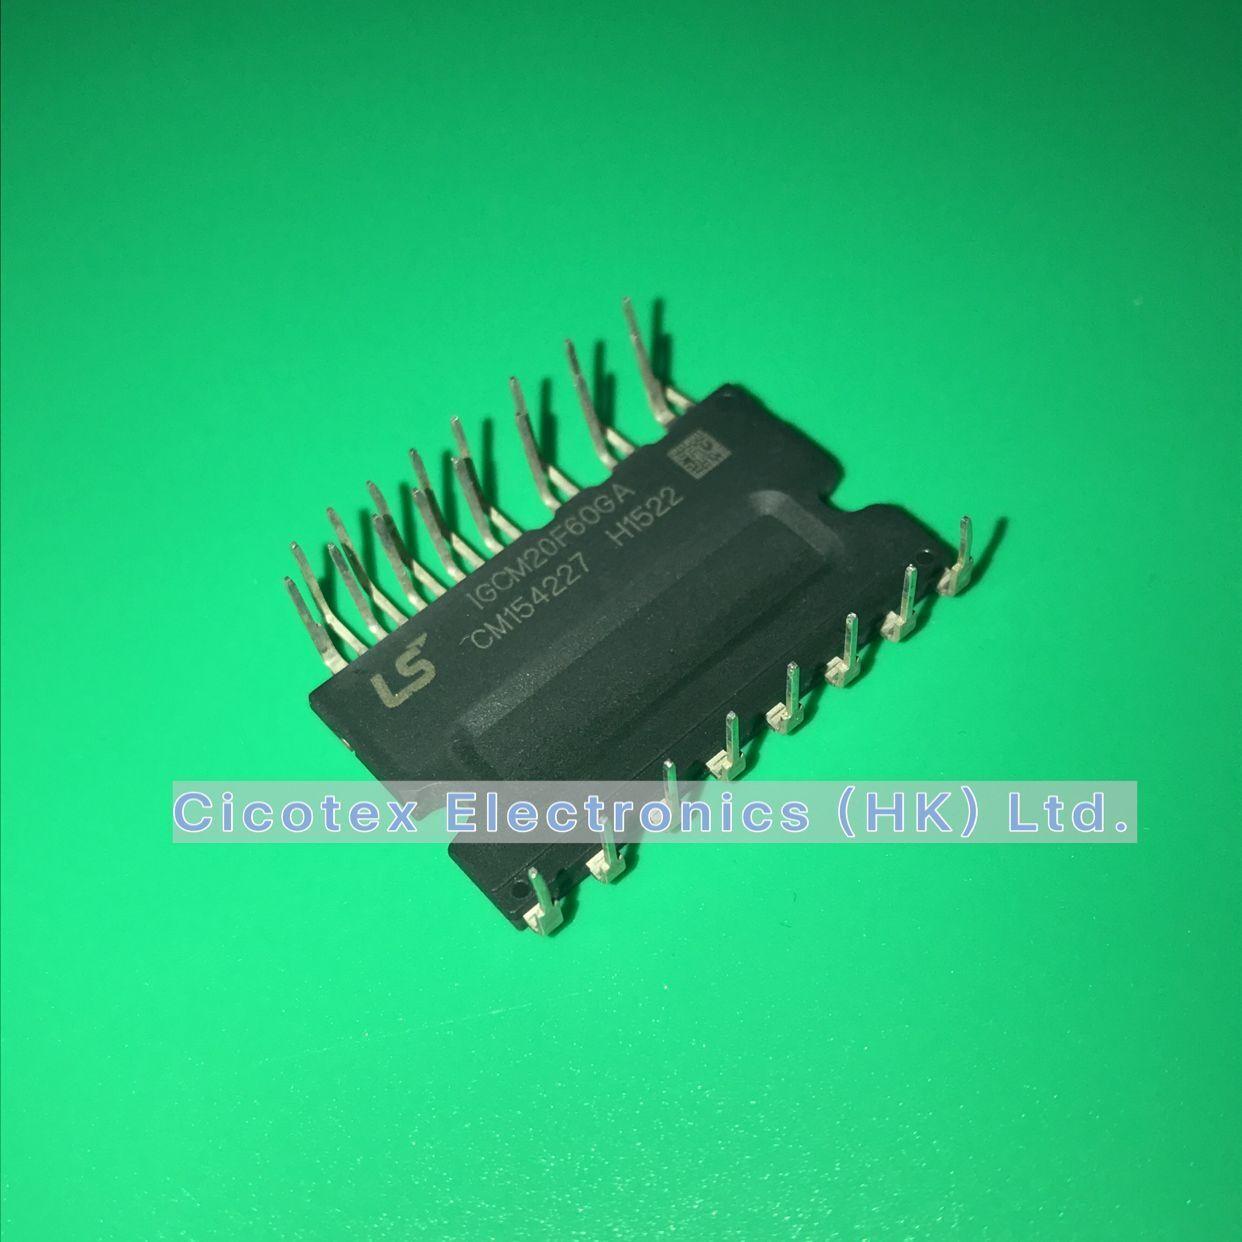 "IGCM20F60GA module IGCM 20F60GA IGBT Power Driver Module IGBT 3 Phase 600V 20A 24-PowerDIP Module (1.028"", 26.10mm) 24MDIP F60GA"